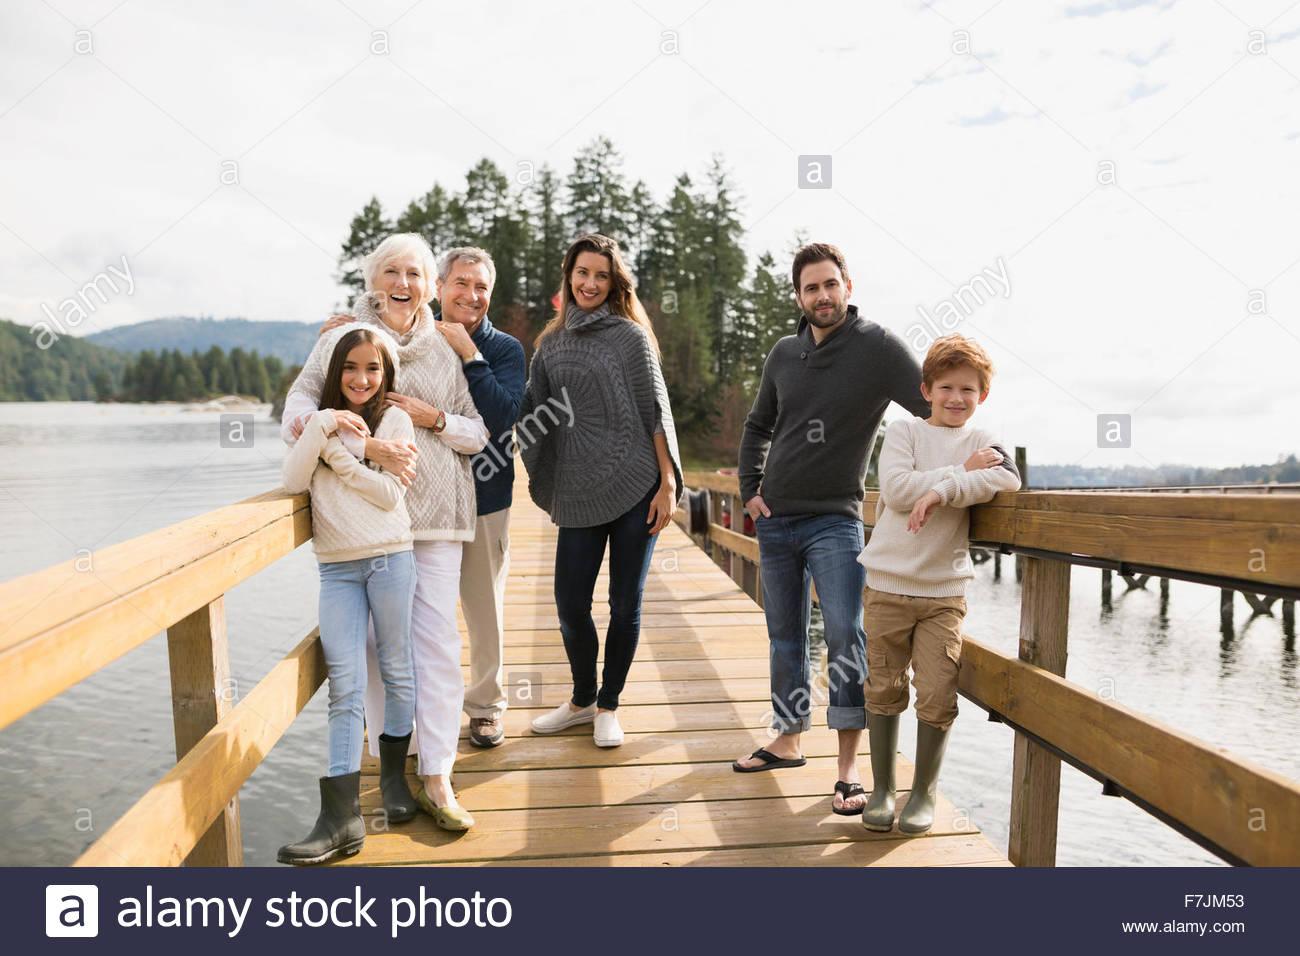 Portrait smiling multi-generation family on lake dock - Stock Image